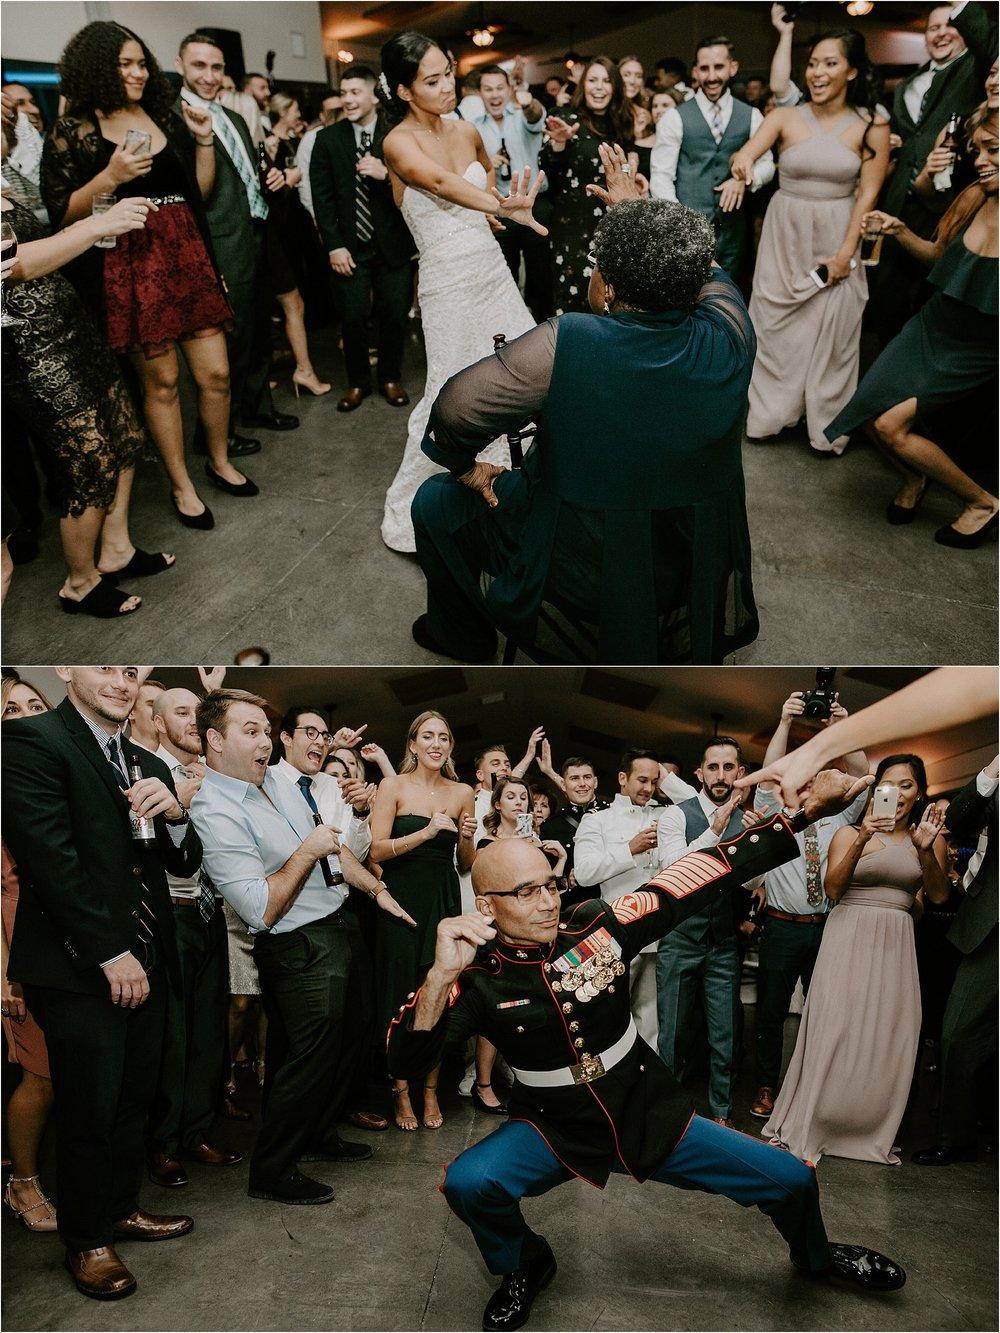 Sarah_Brookhart_Harrisburg_Wedding_Photographer_0062.jpg